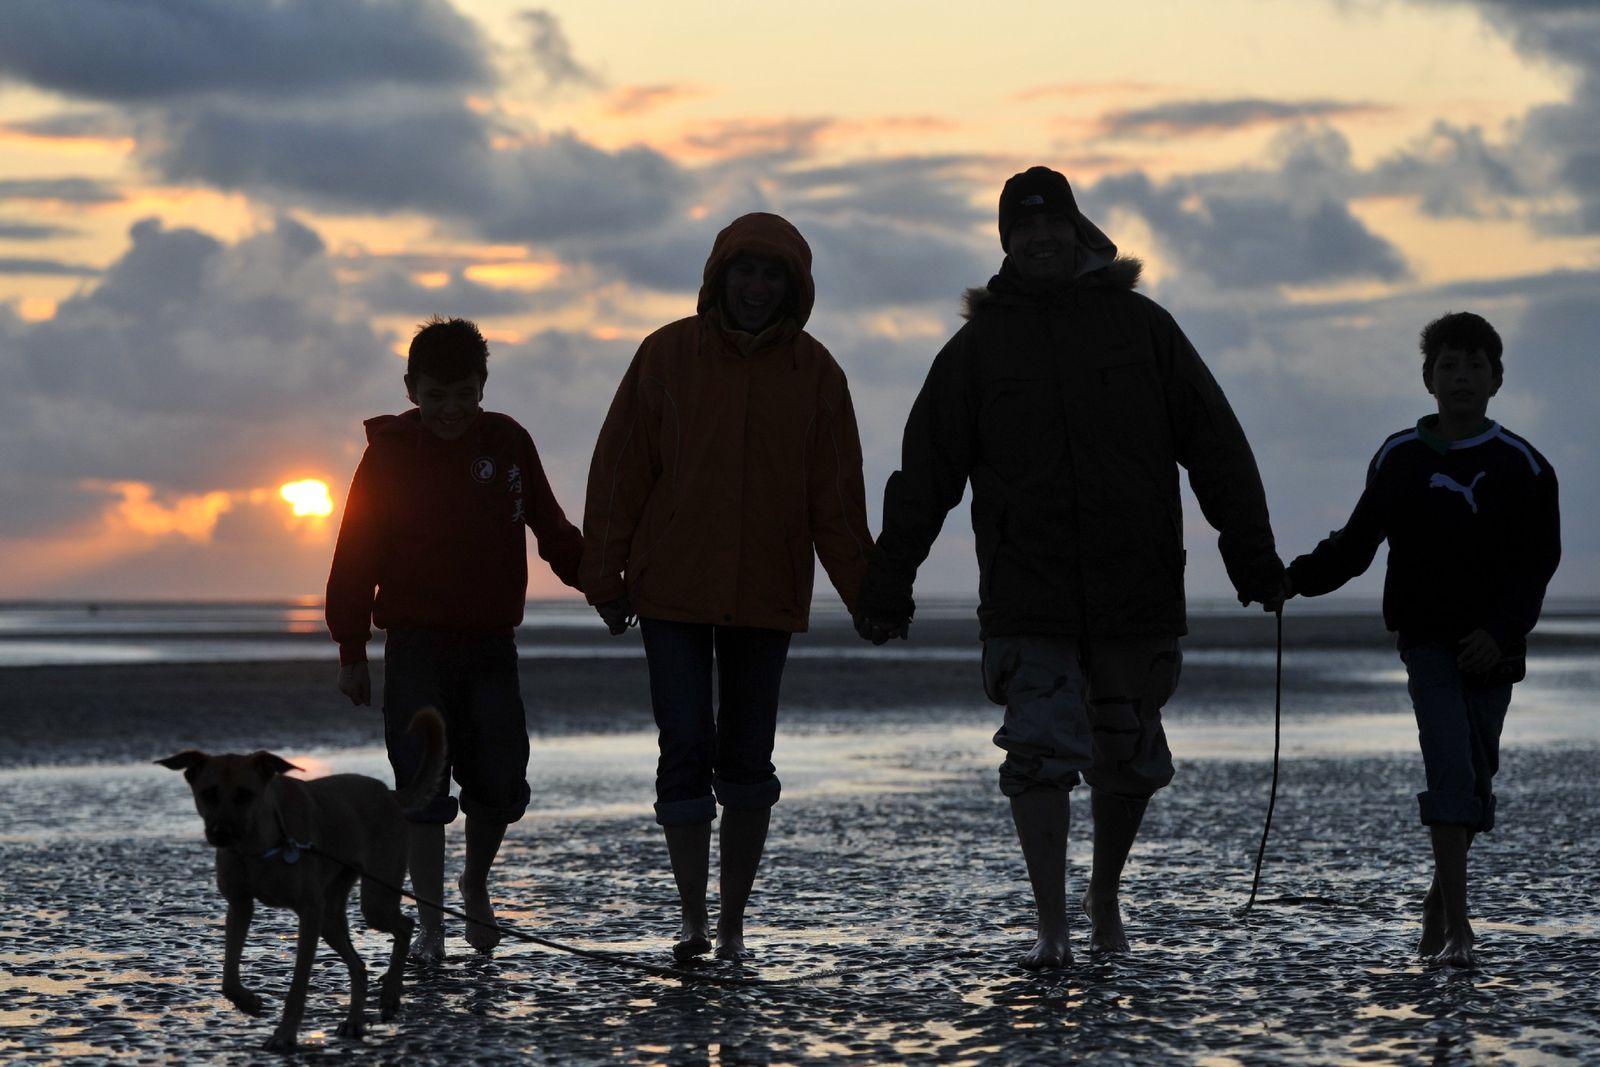 Familienspaziergang an der Nordsee